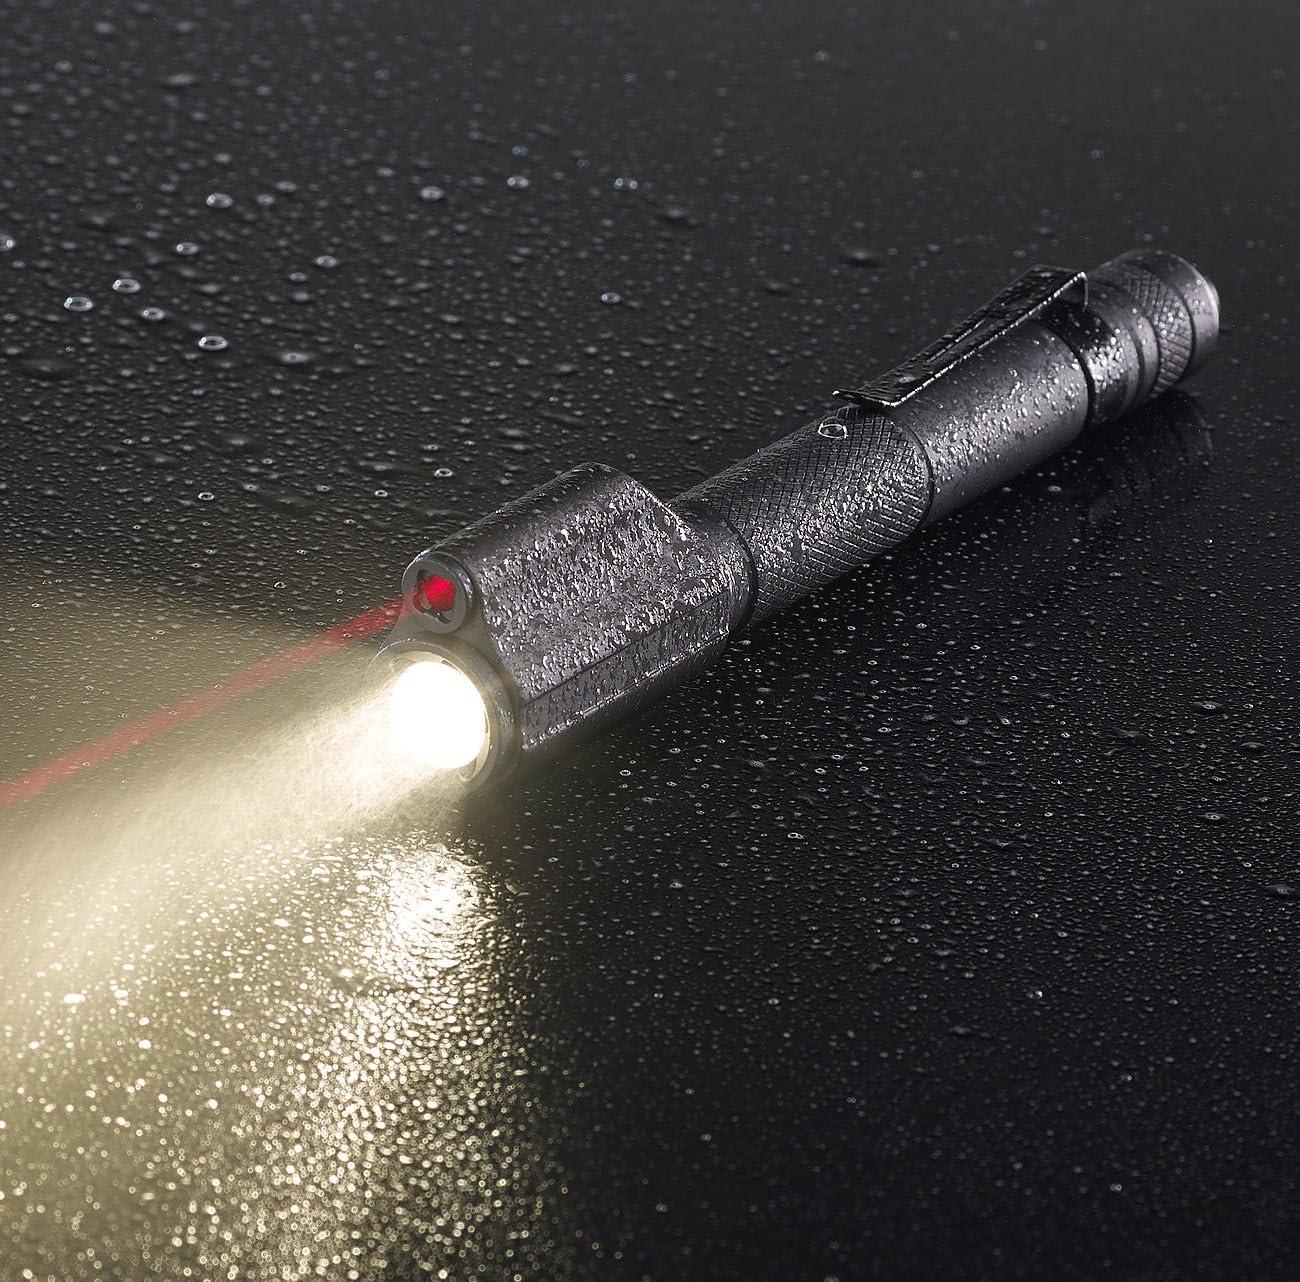 LED-Taschenlampe /& Laser-Pointer 110 lm 3 W KryoLights 2in1-Profi-Pen-Light